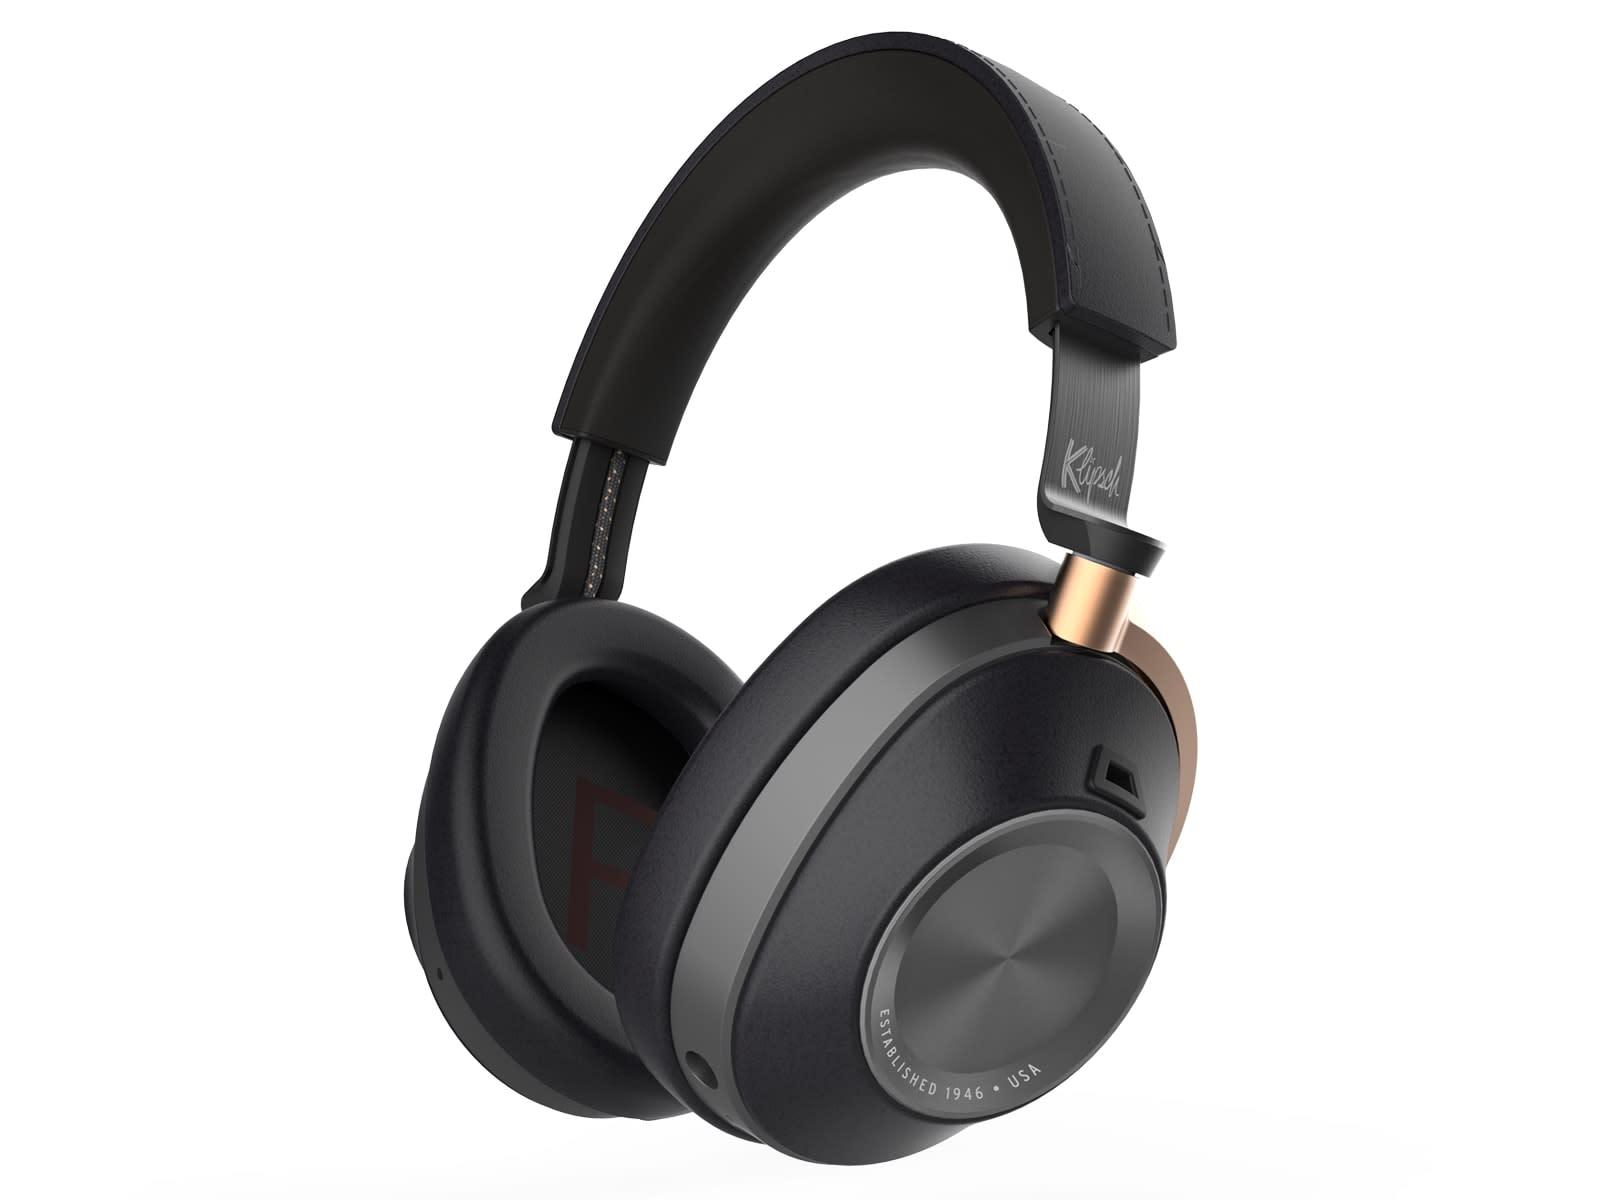 Klipsch over-ear noise cancelling headphones